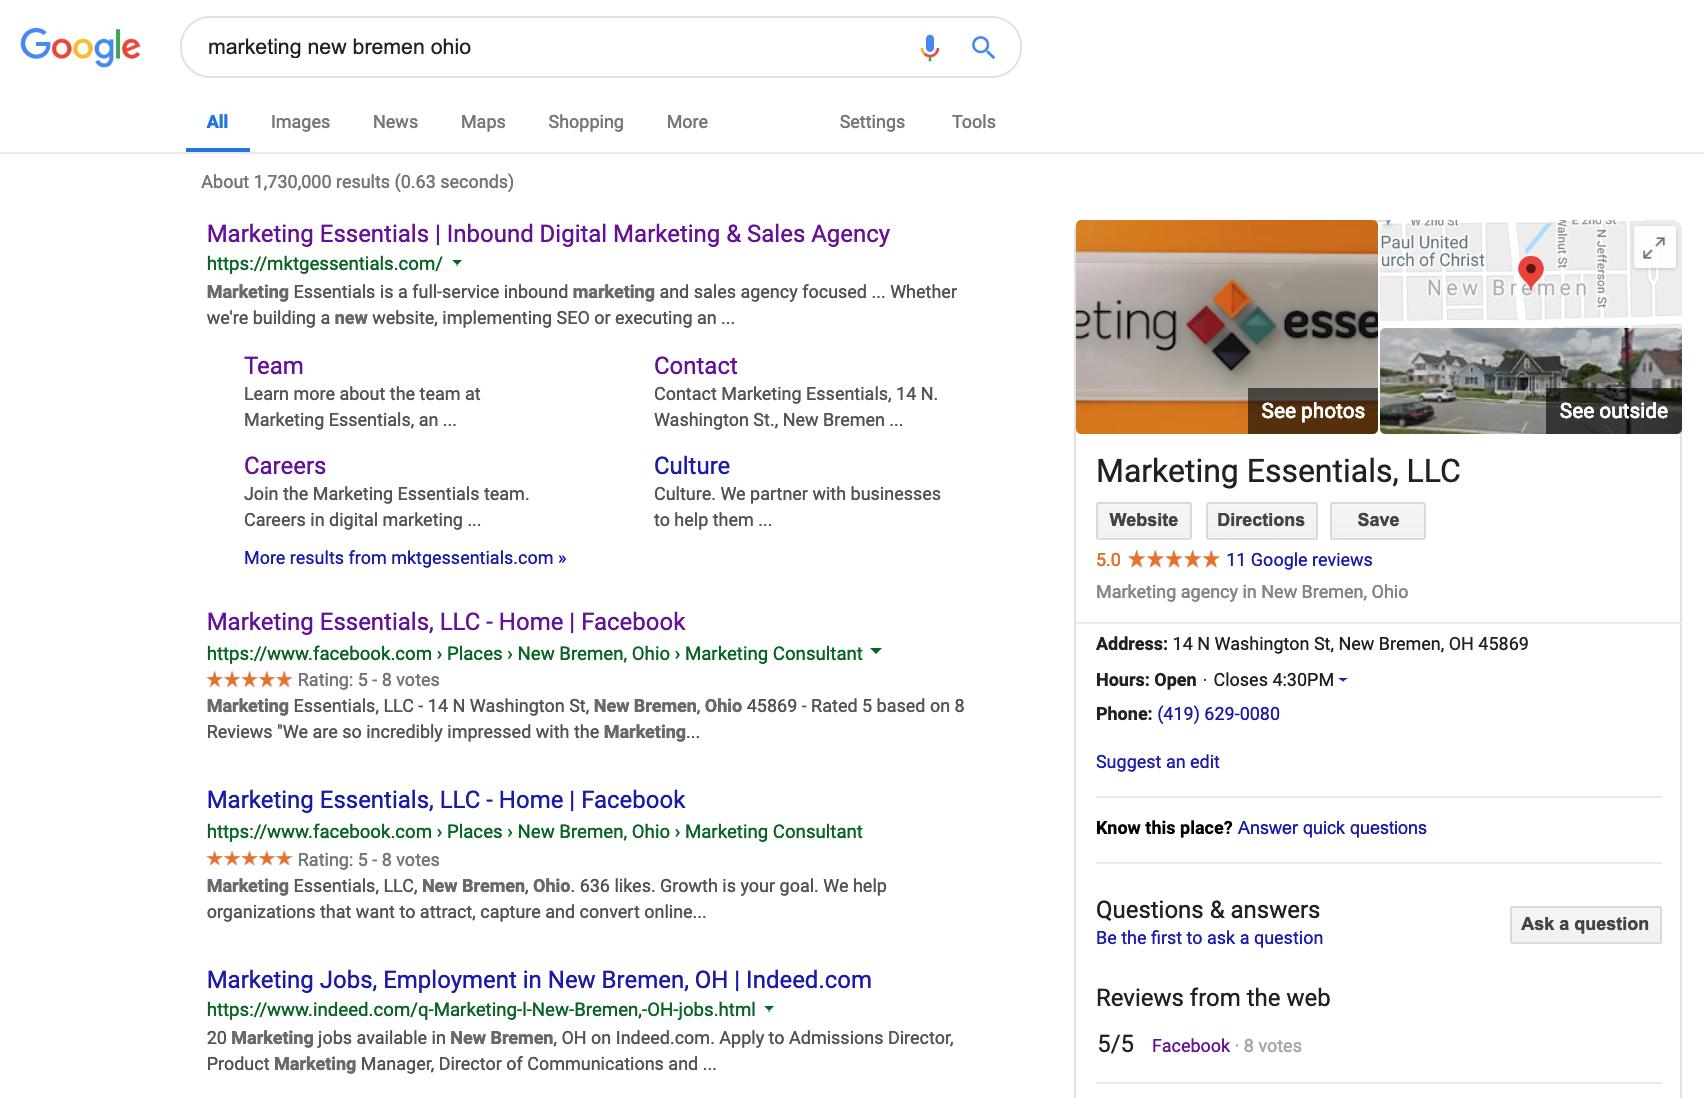 google search for marketing essentials